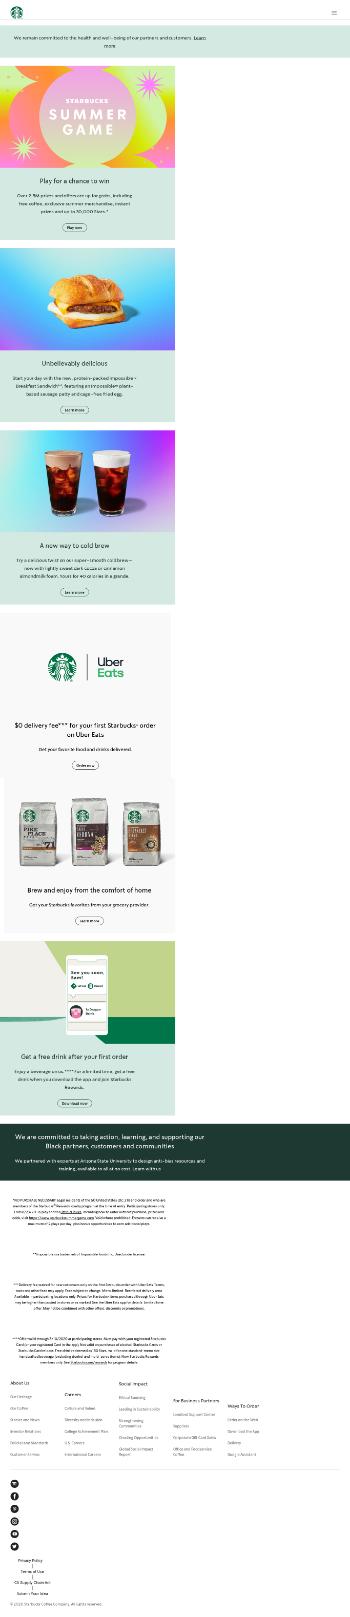 Starbucks Corporation Website Screenshot